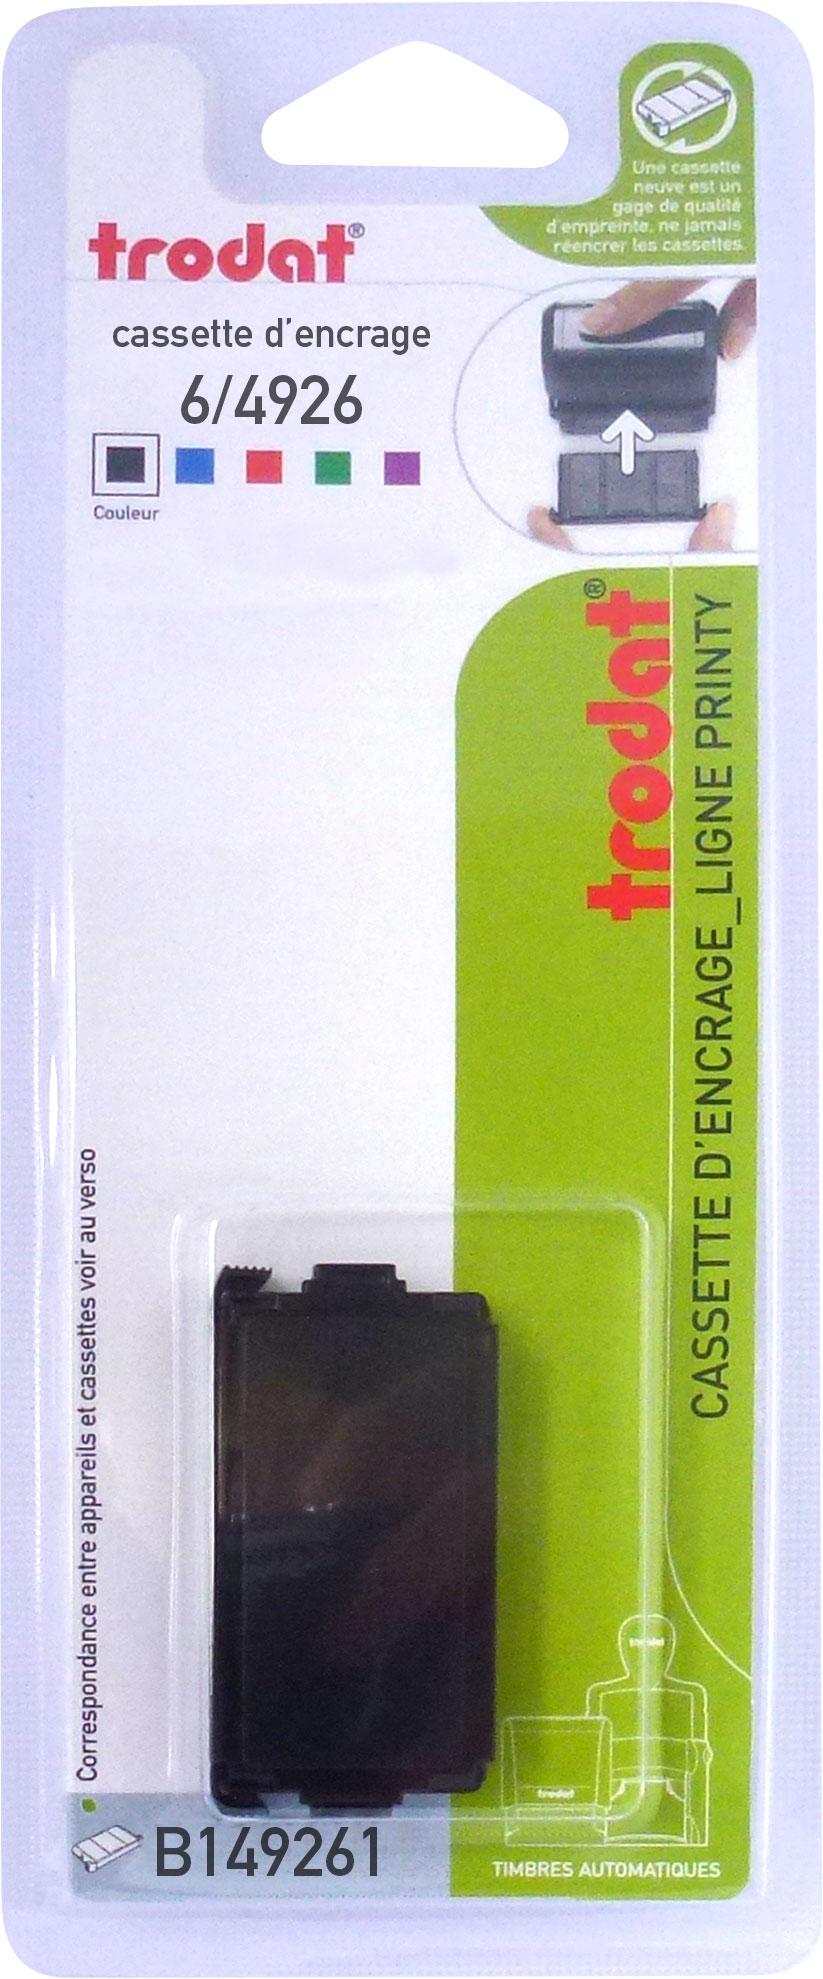 Trodat - Encrier 6/4926 recharge pour tampon Printy 4926/4726 - noir